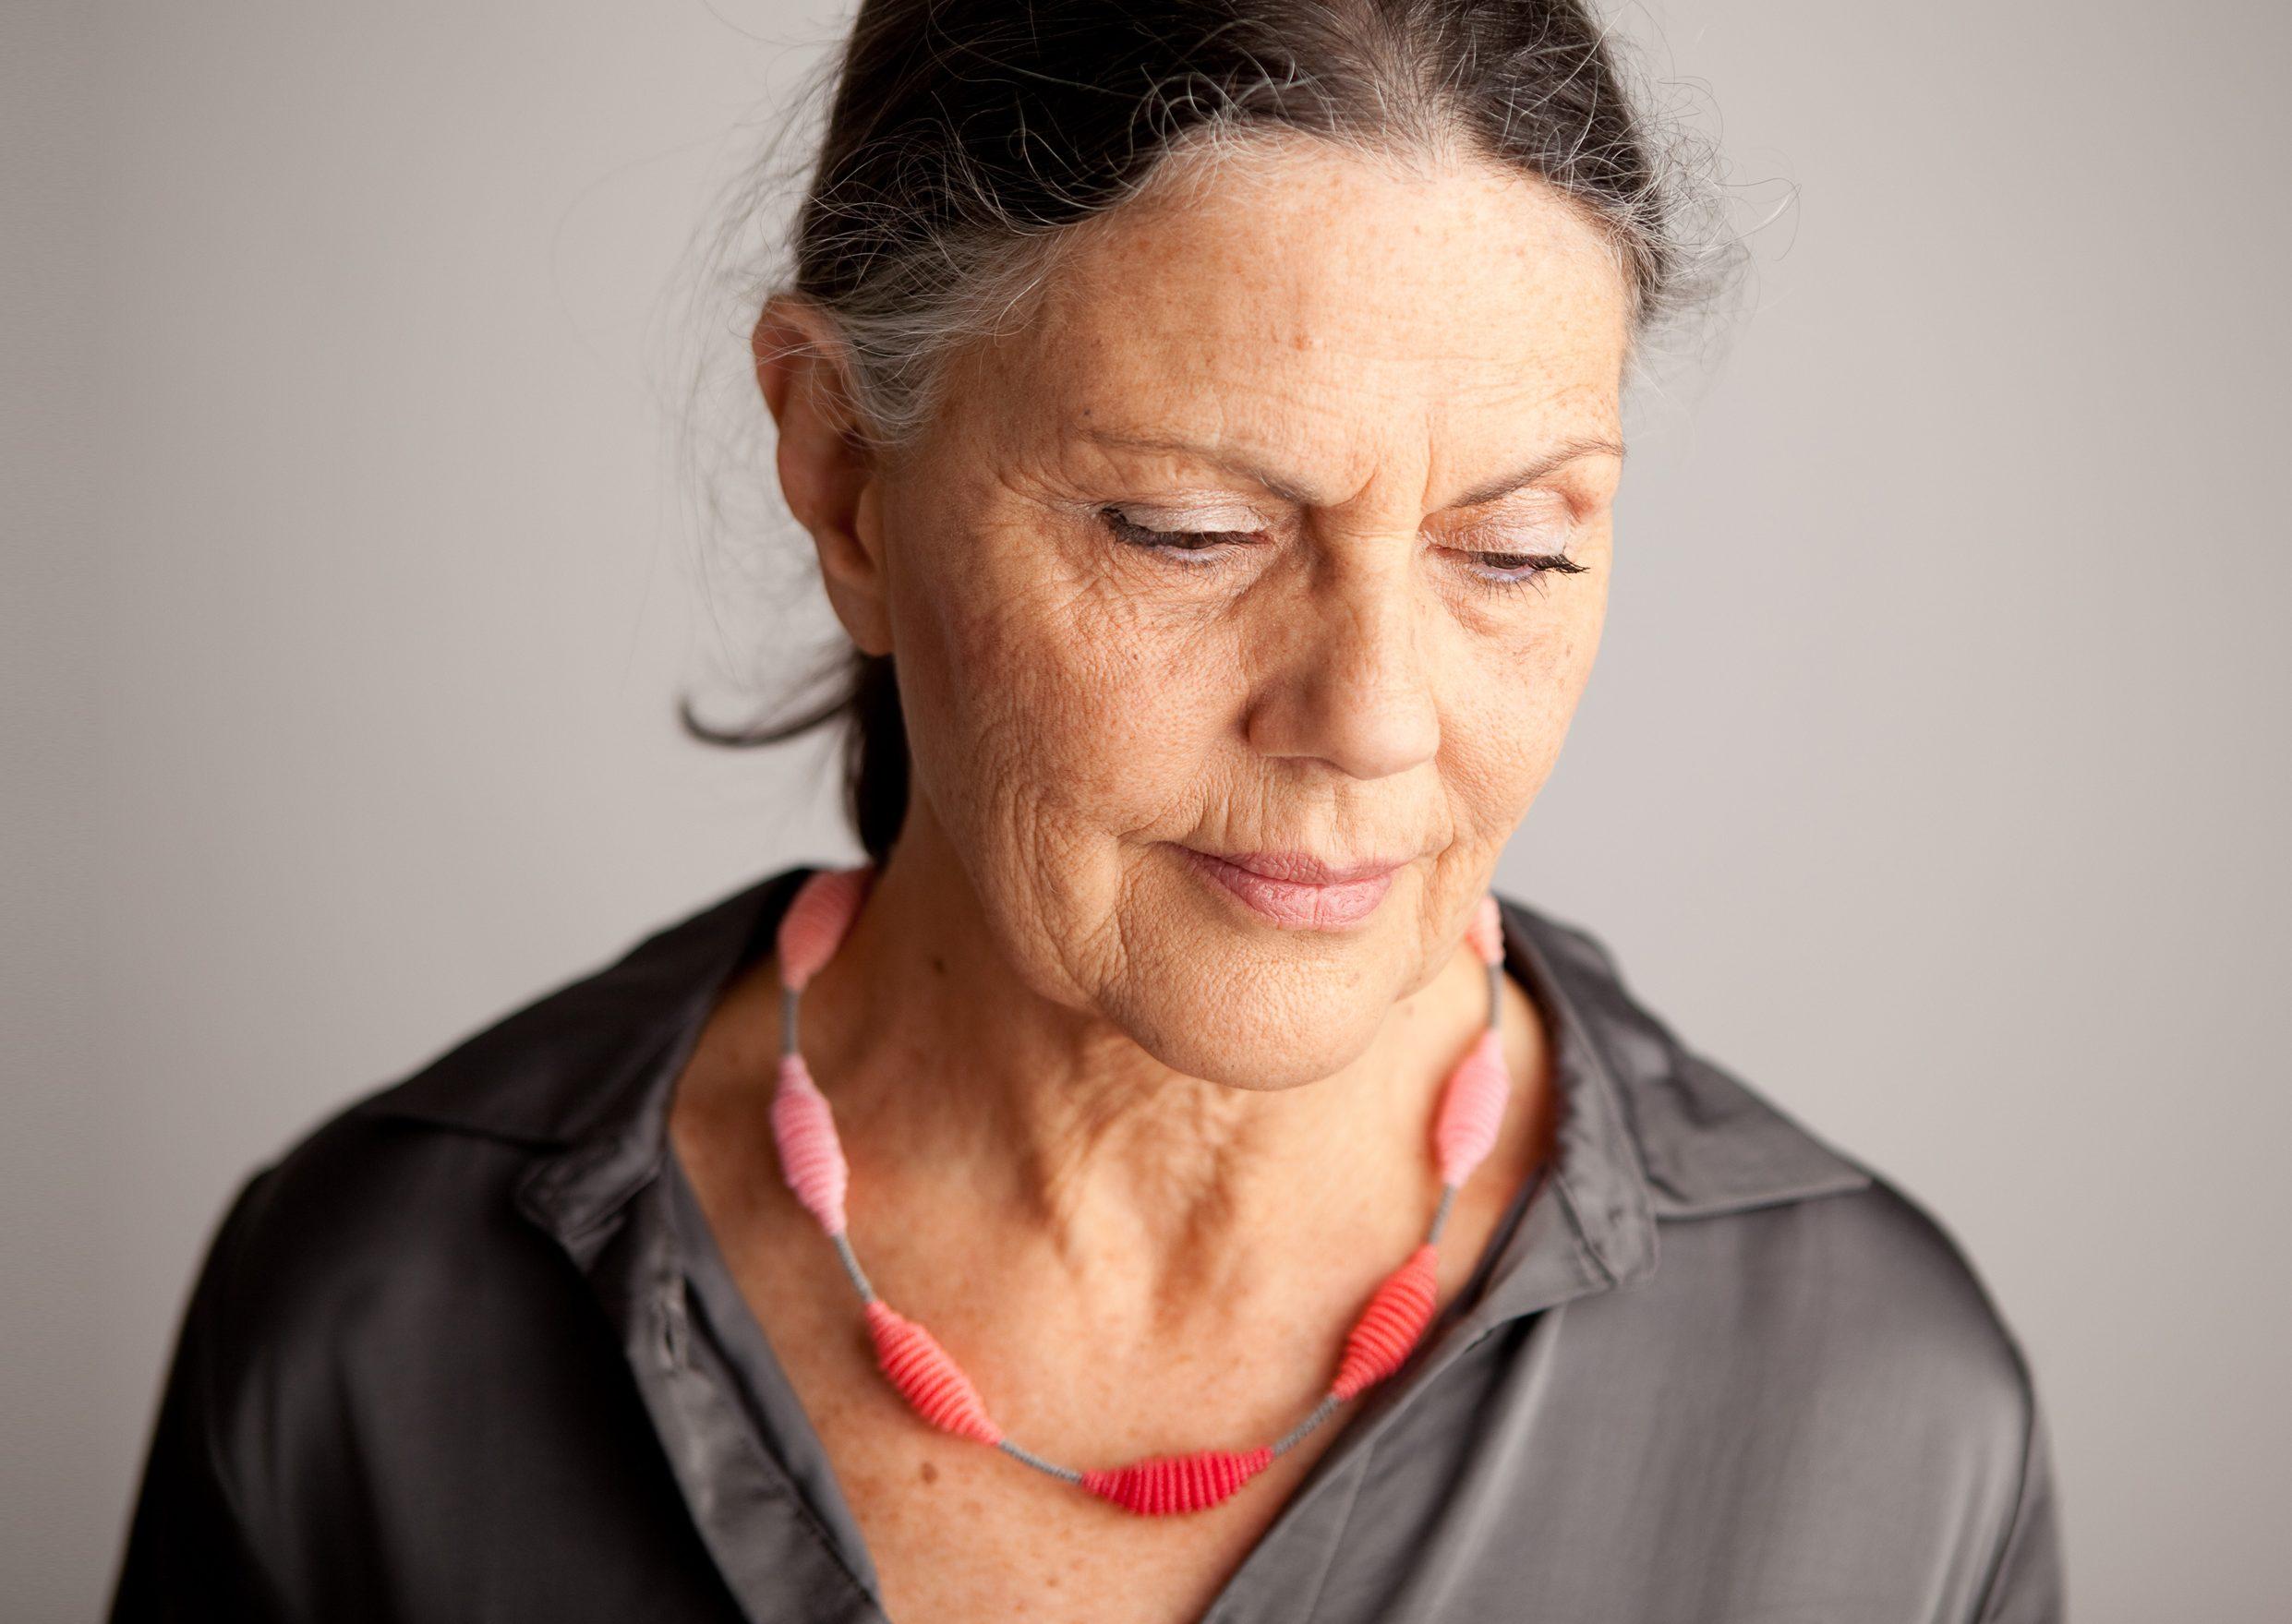 Anke Hennig, Linea I, halssieraad. Foto met dank aan Anke Hennig©